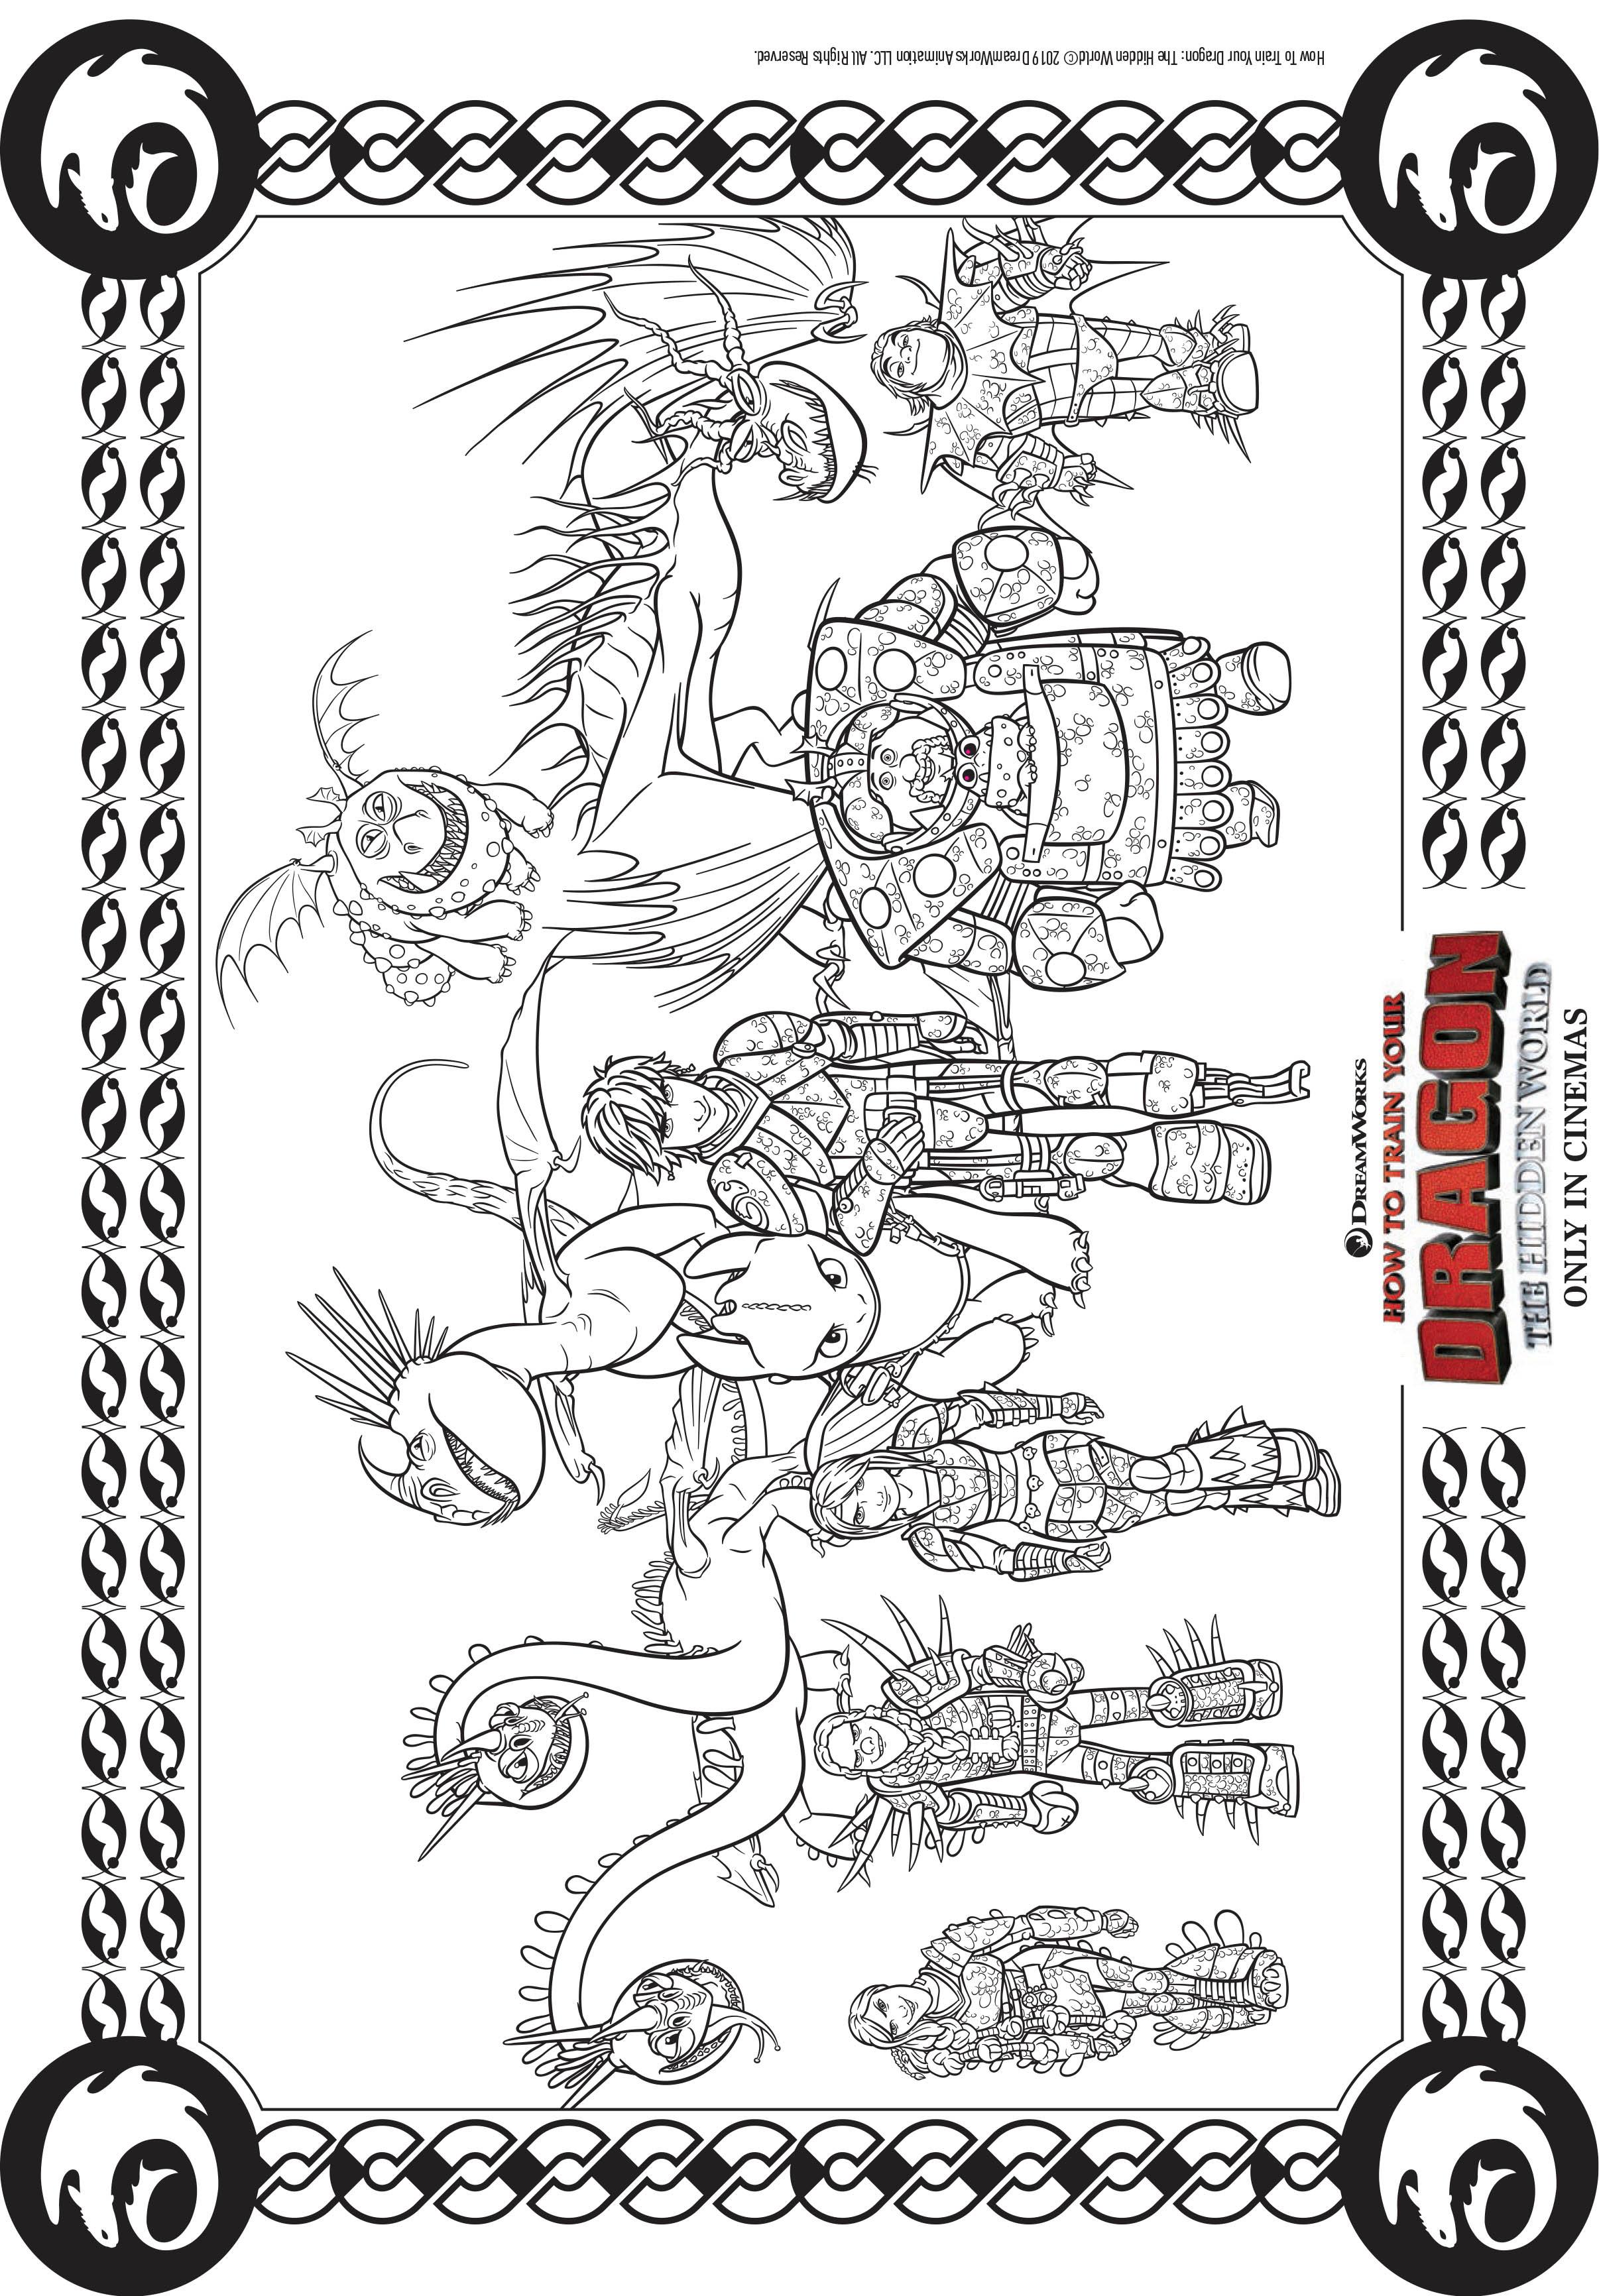 Coloriage Dragon 3 A Imprimer : coloriage, dragon, imprimer, Personnages, Dragons, Coloriage, Coloriages, Enfants